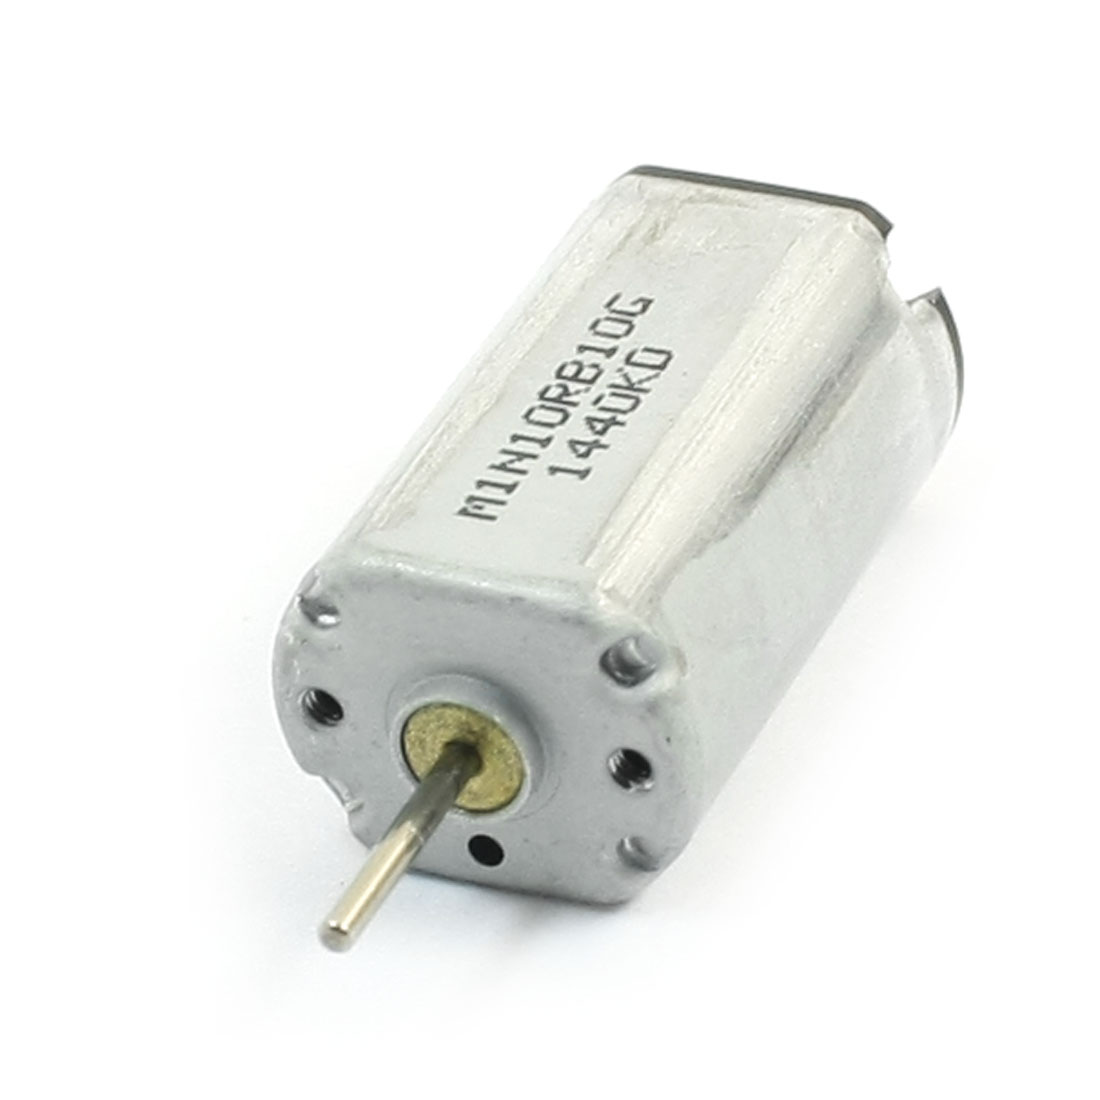 Replacement 5V 13316RPM 1mm Shaft Dia High Torque Mini DC Motor